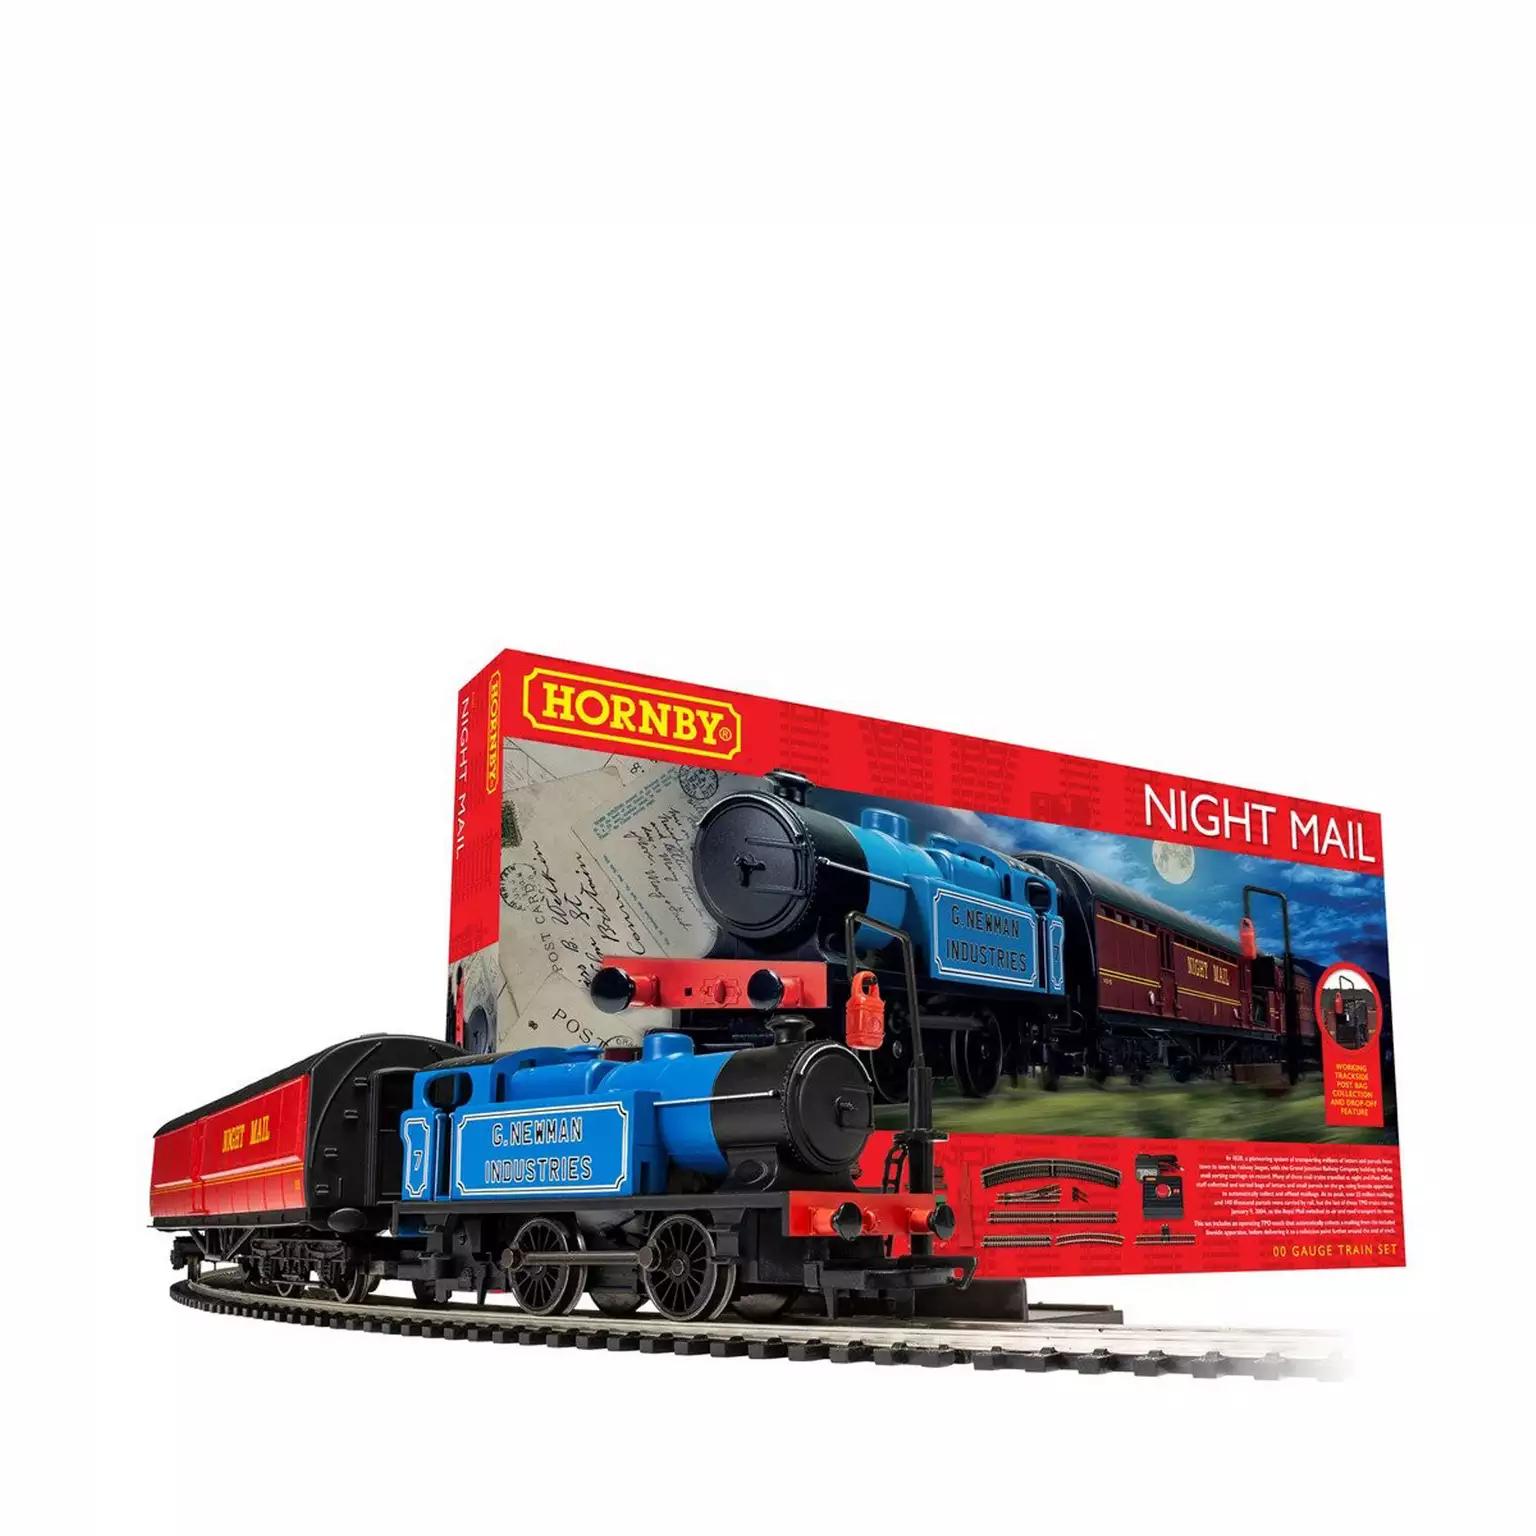 Hornby Night Mail Train Set - £99.99 delivered @ Debenhams